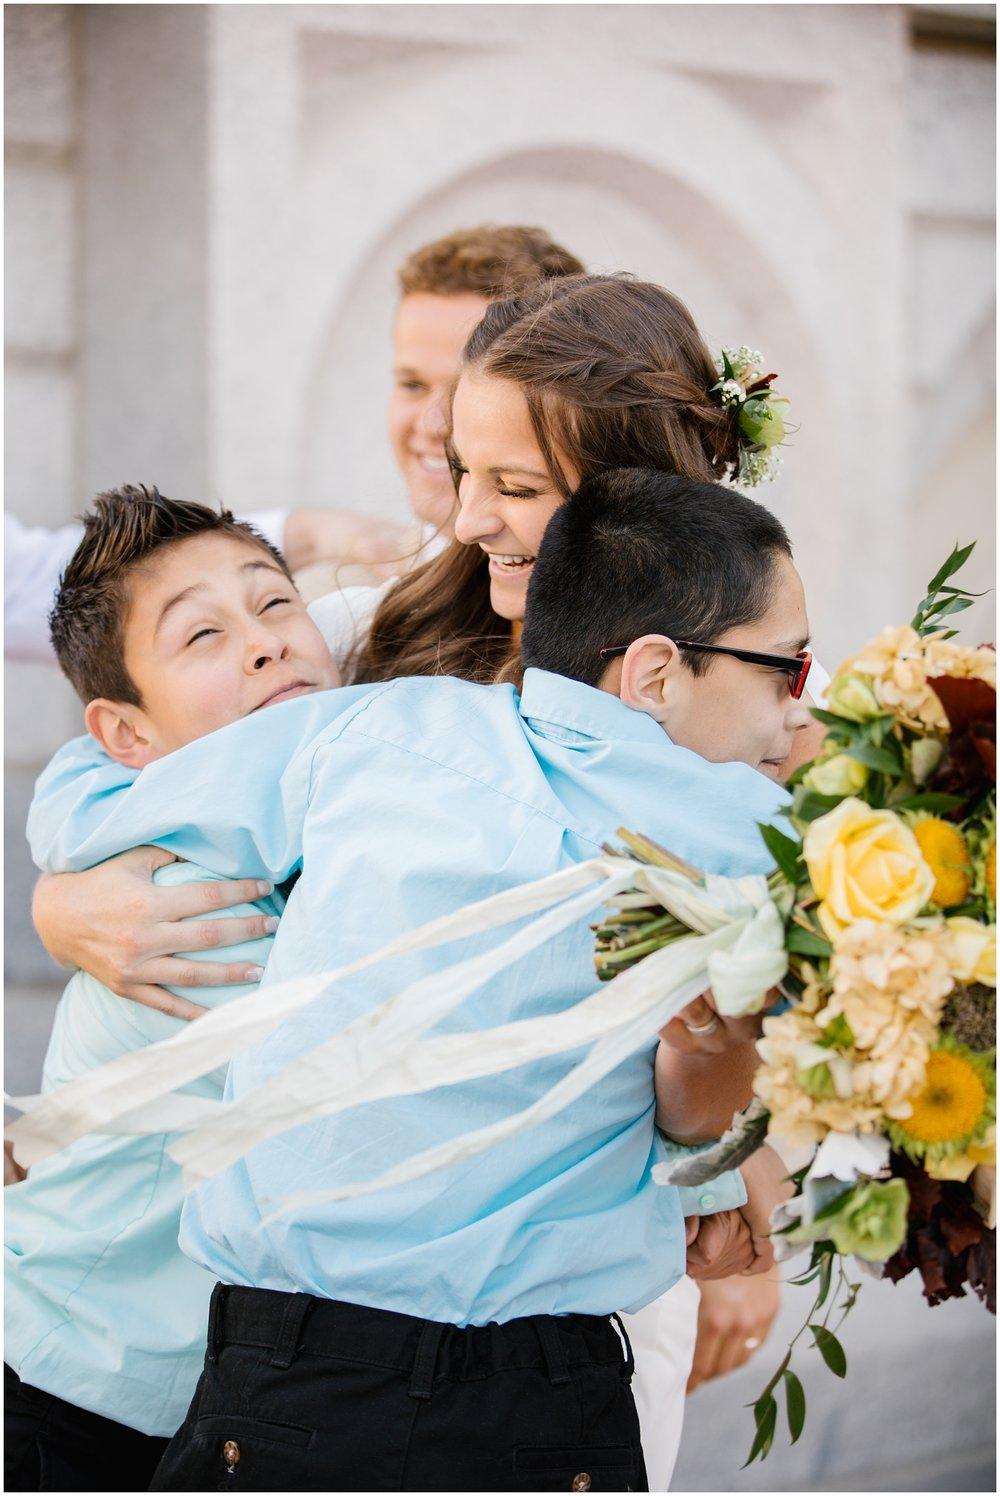 JC-Wedding-55_Lizzie-B-Imagery-Utah-Wedding-Photographer-Park-City-Salt-Lake-City-Temple-Joseph-Smith-Memorial-Building-Empire-Room.jpg